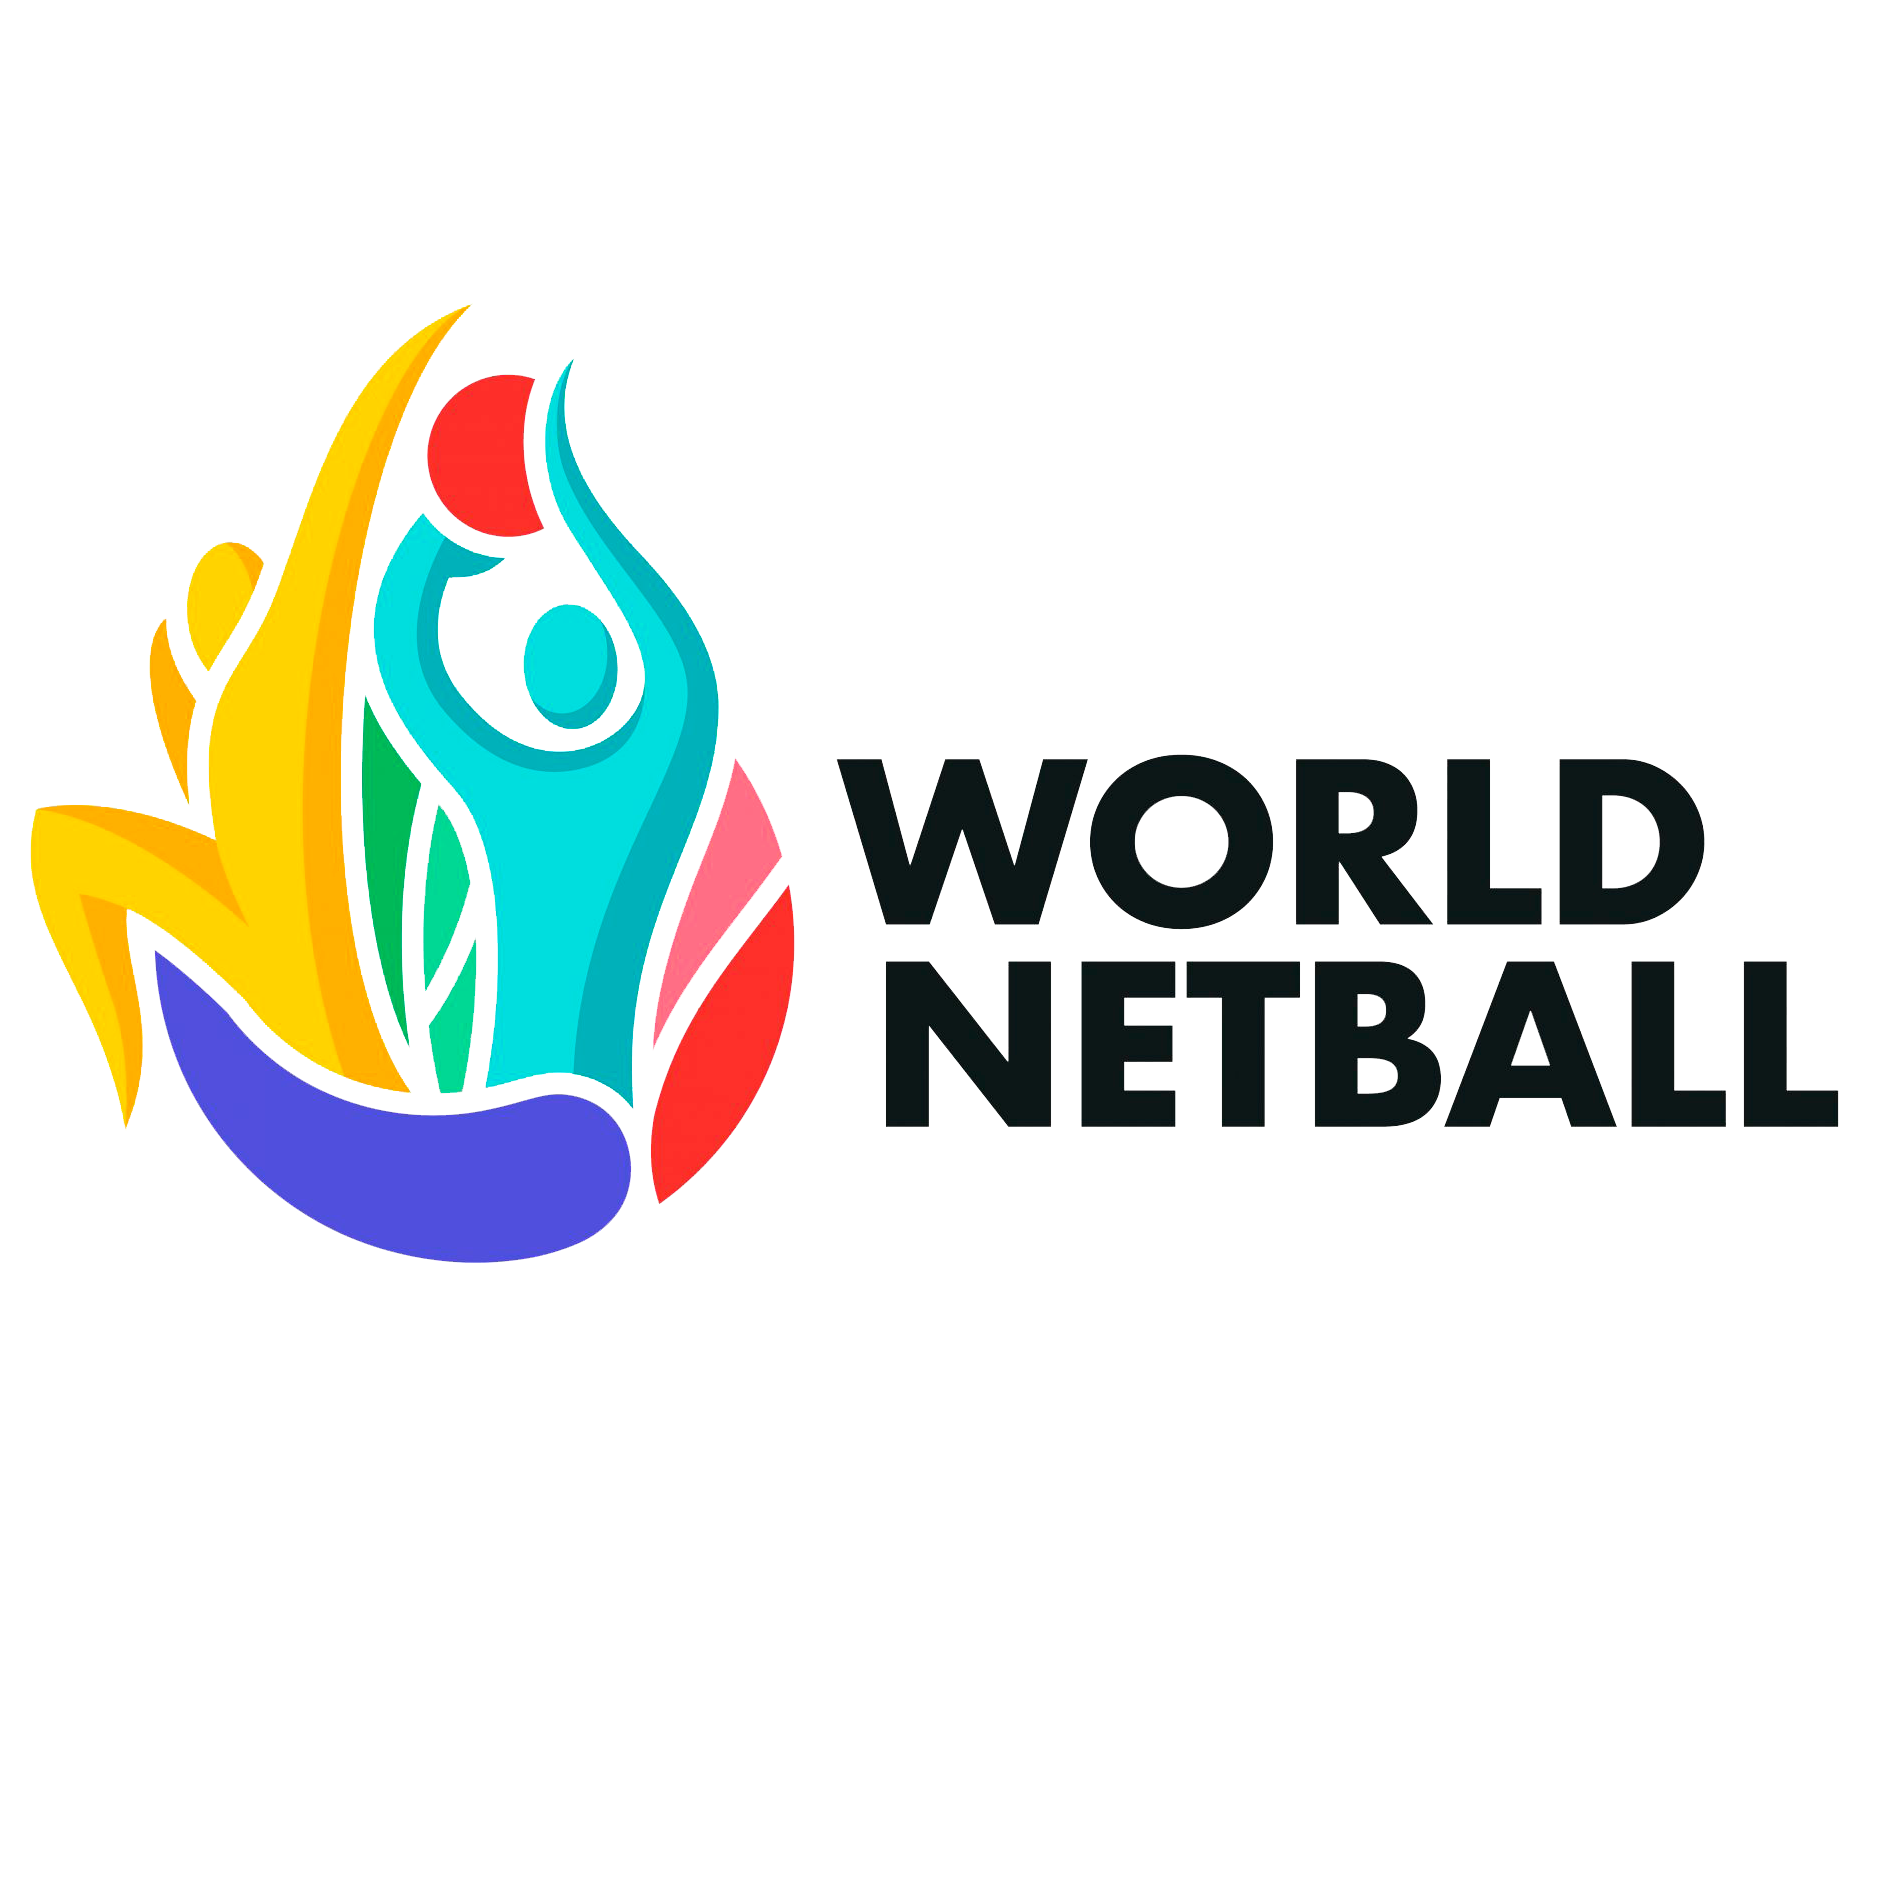 World Netball netWorld